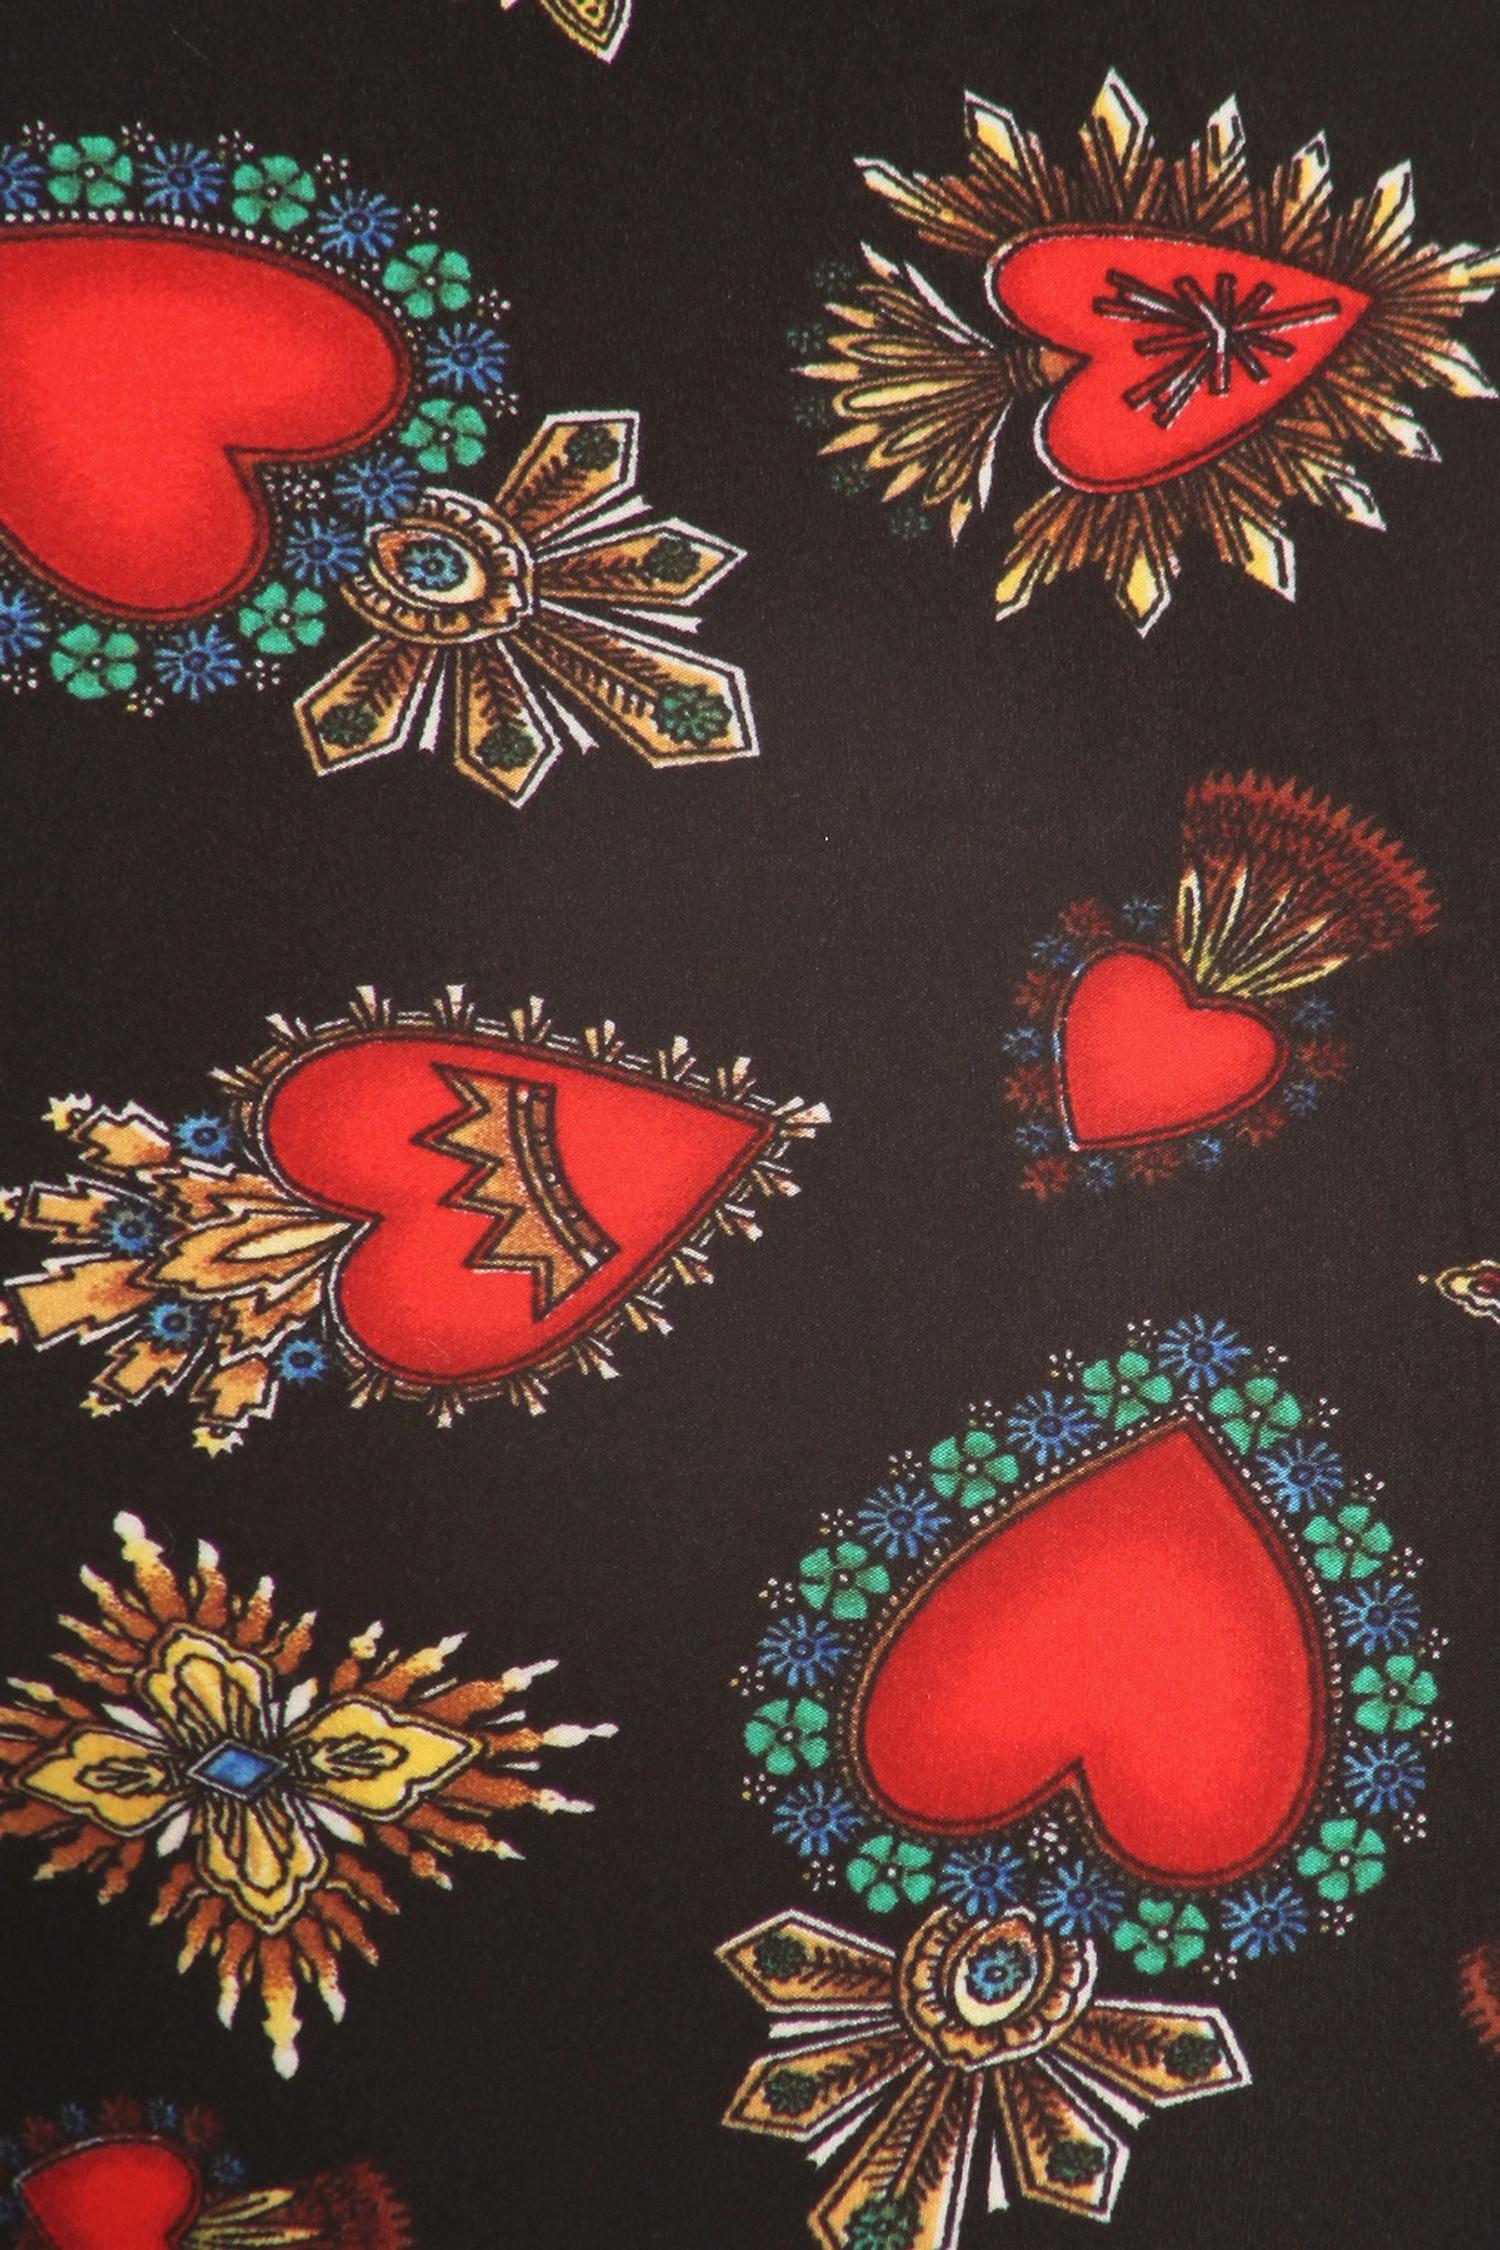 Brushed  Jeweled Hearts Kid's Leggings